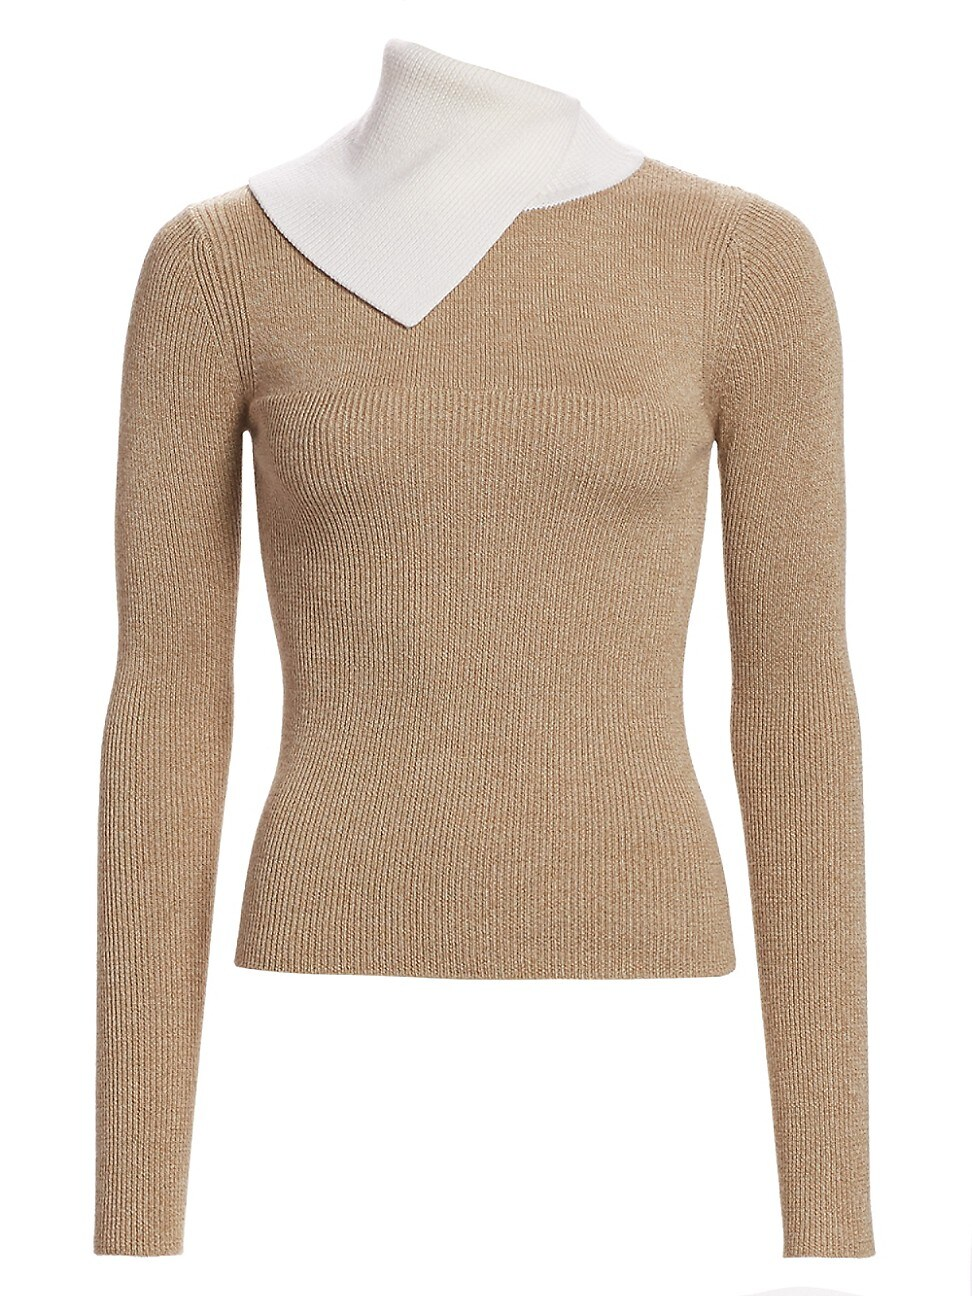 See By Chloé Women's Bicolor Rib-knit Merino Wool Sweater In Beige White